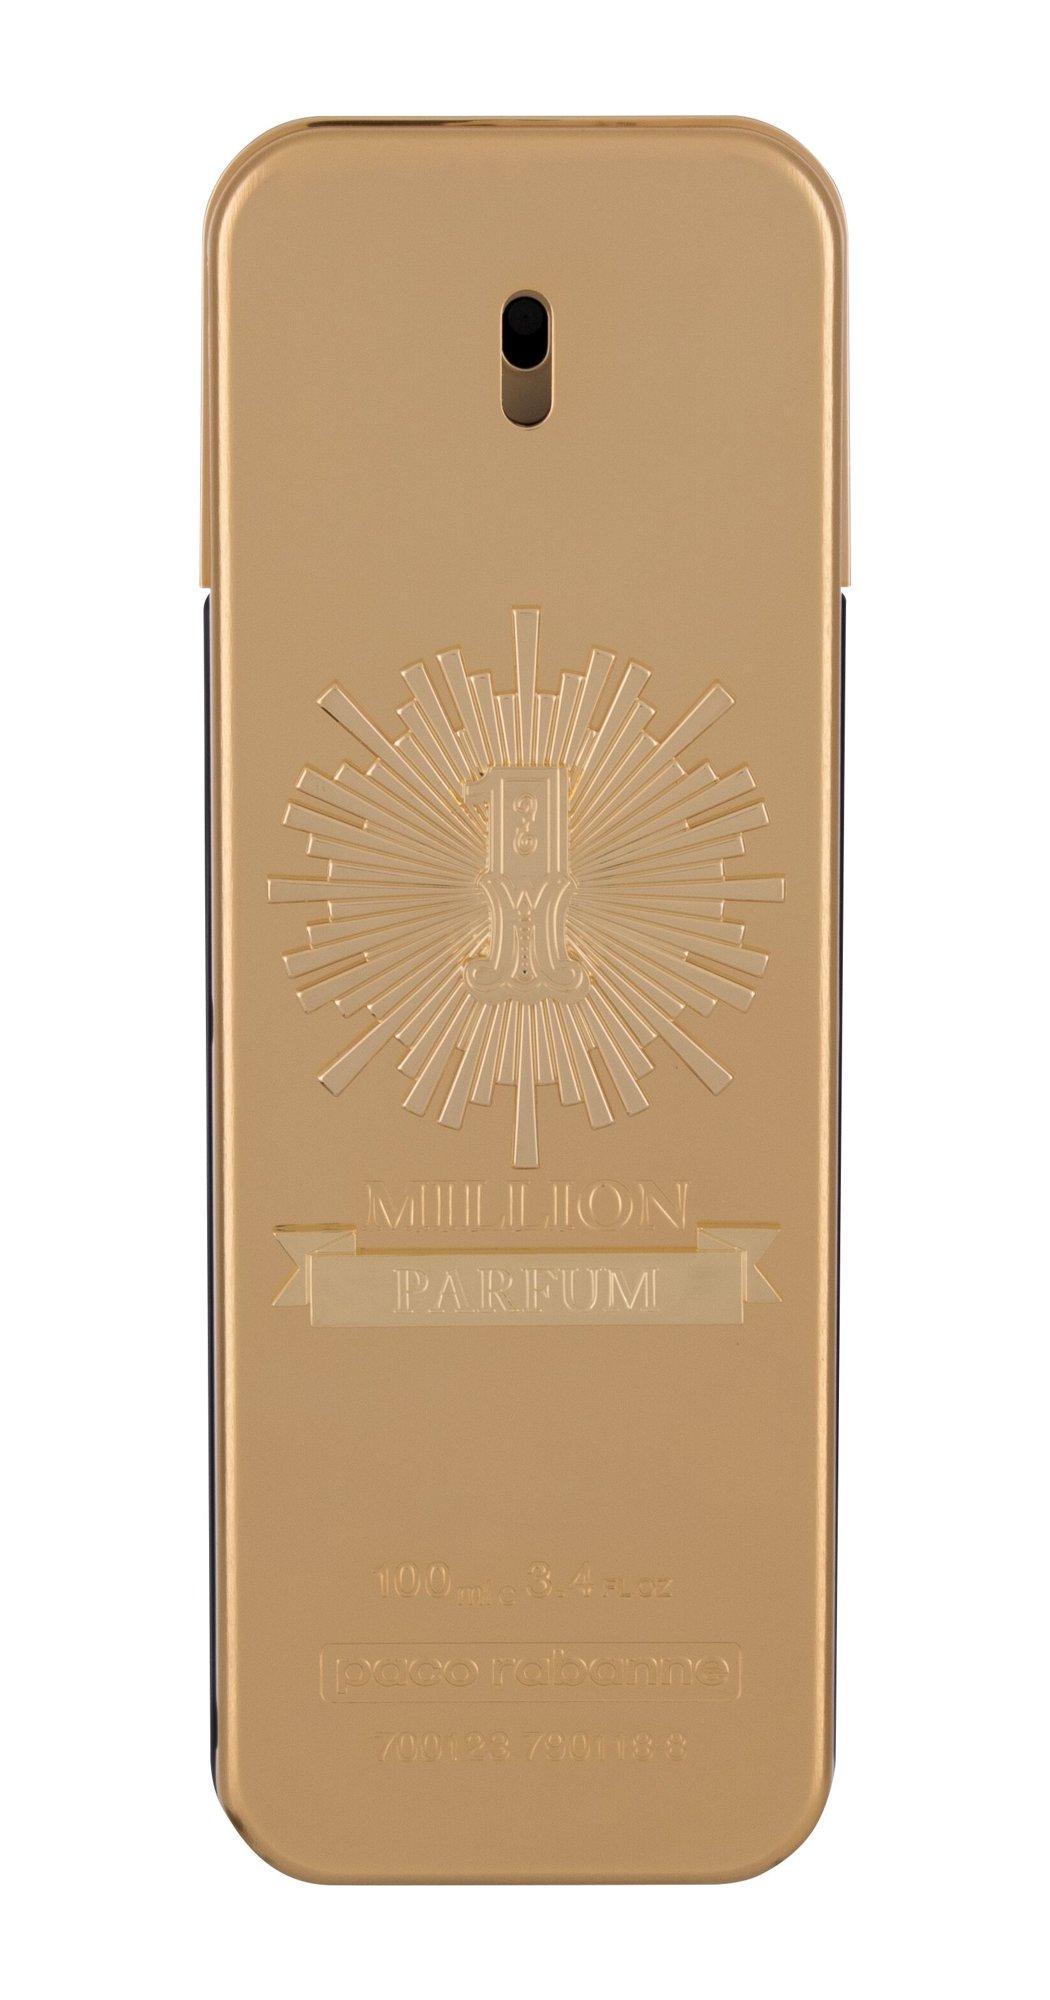 Paco Rabanne 1 Million - parfém M Objem: 100 ml